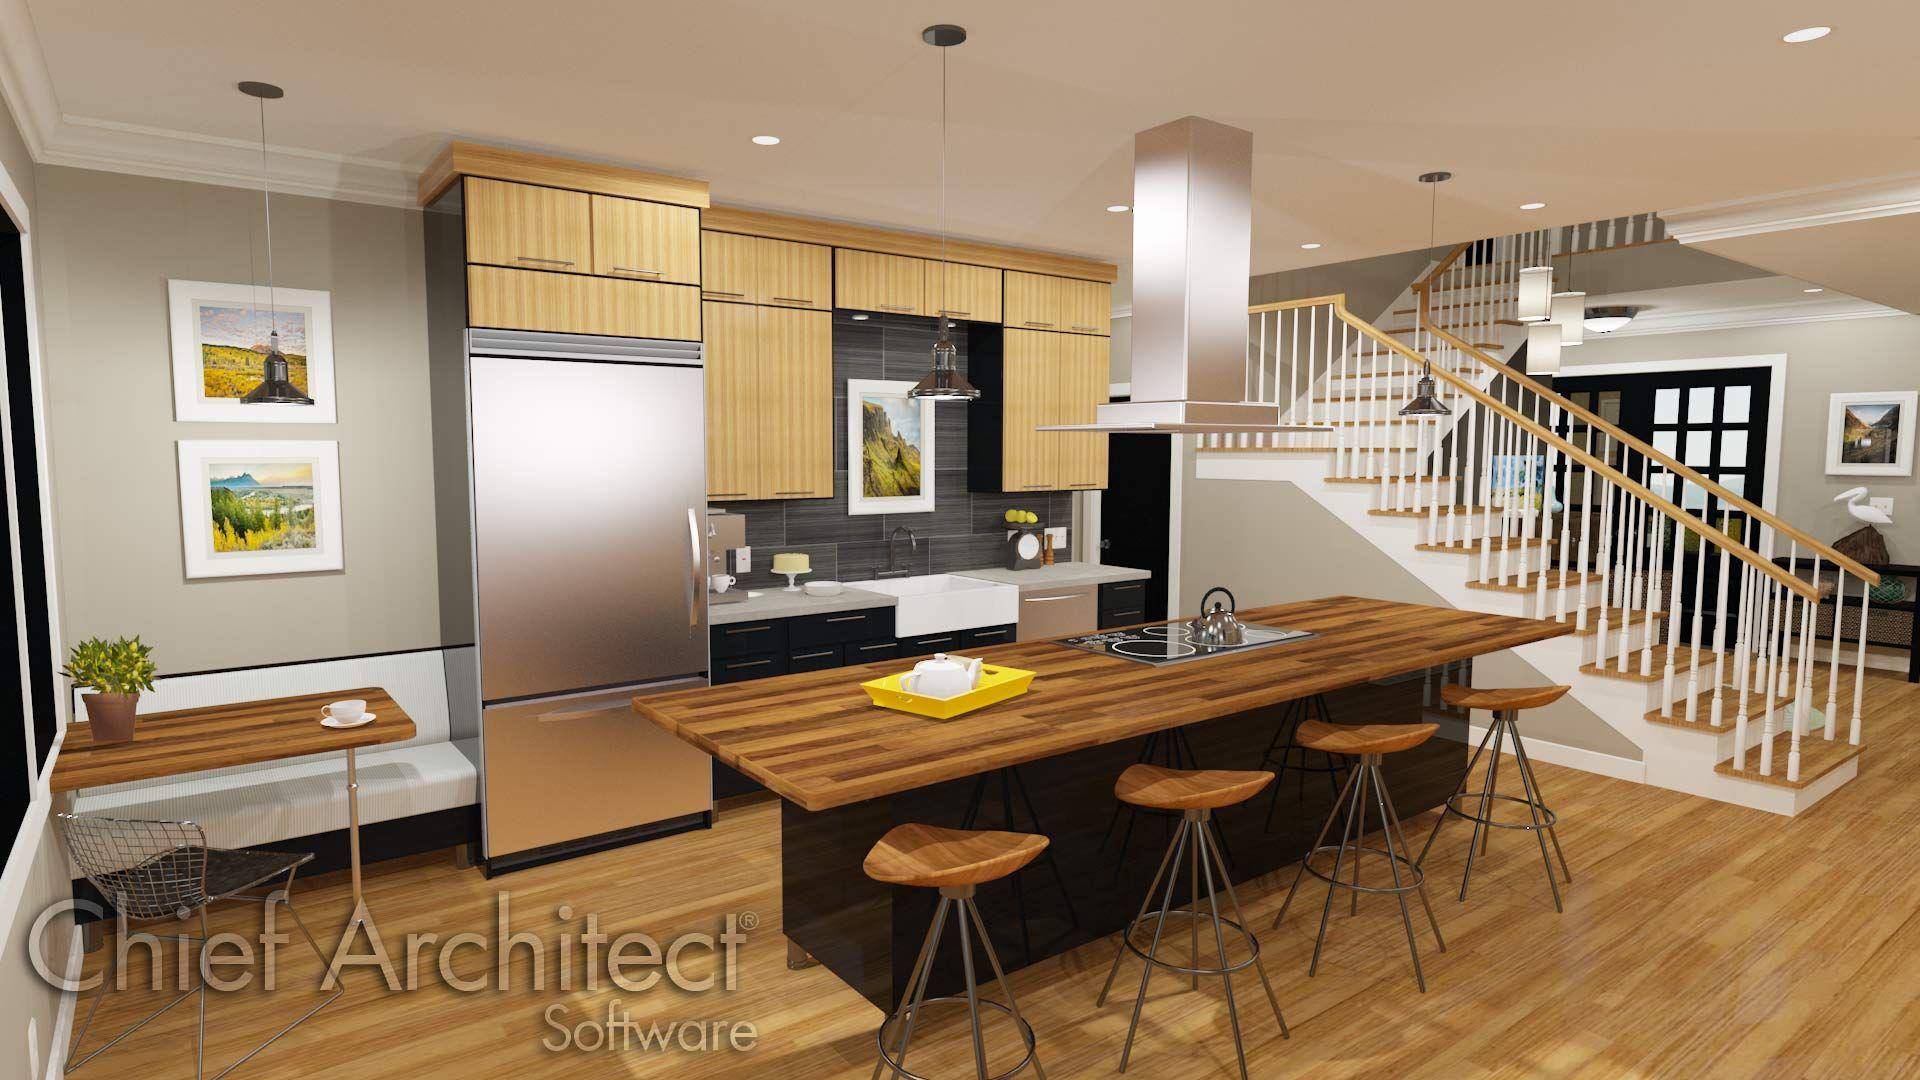 Chief Architect Kitchen Chief Architect House Design Architect